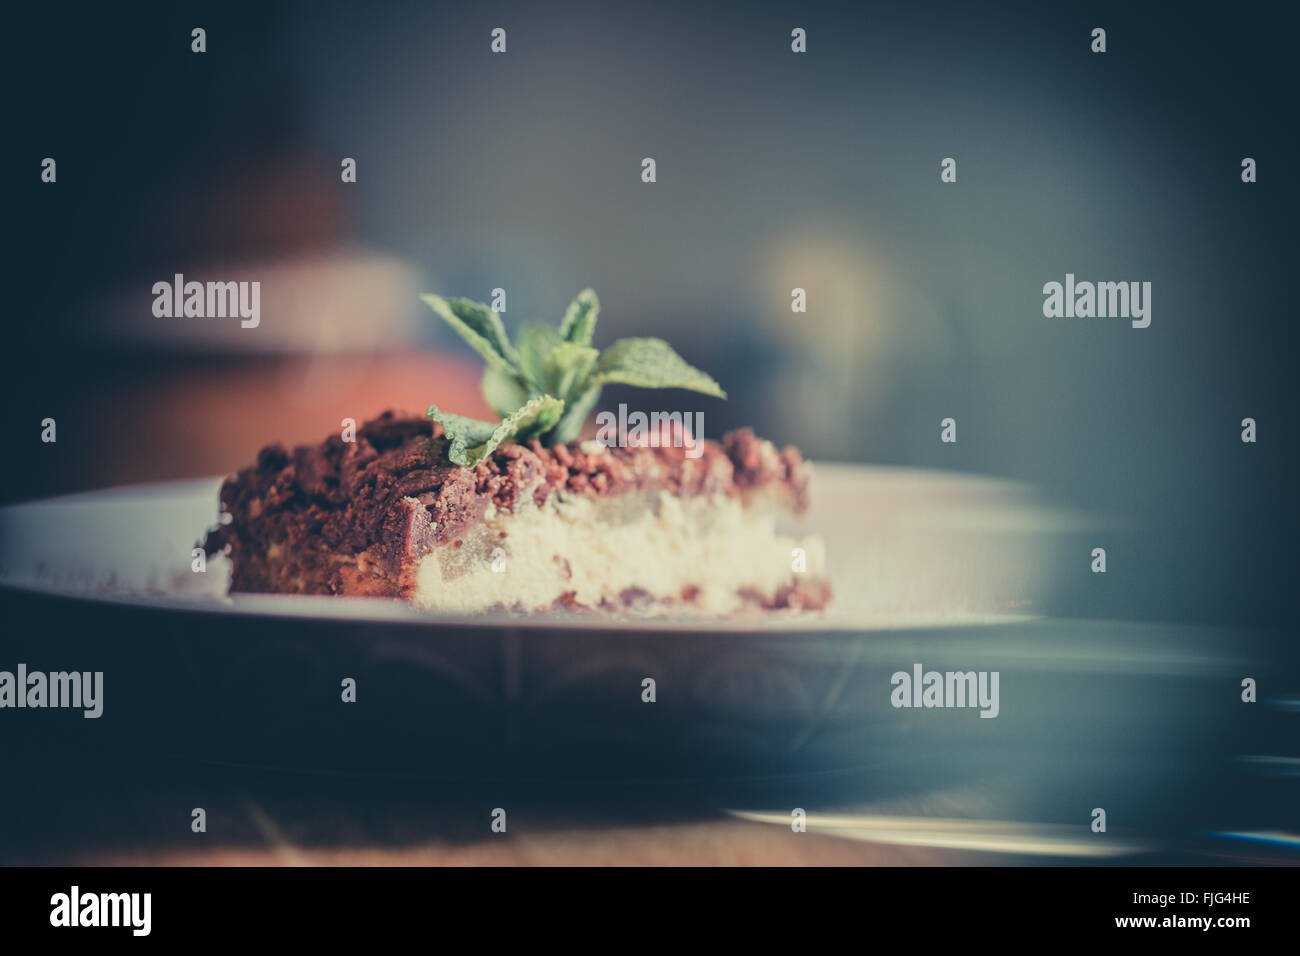 Food Cake Bake Cheesecake sucré plaque Photo Stock